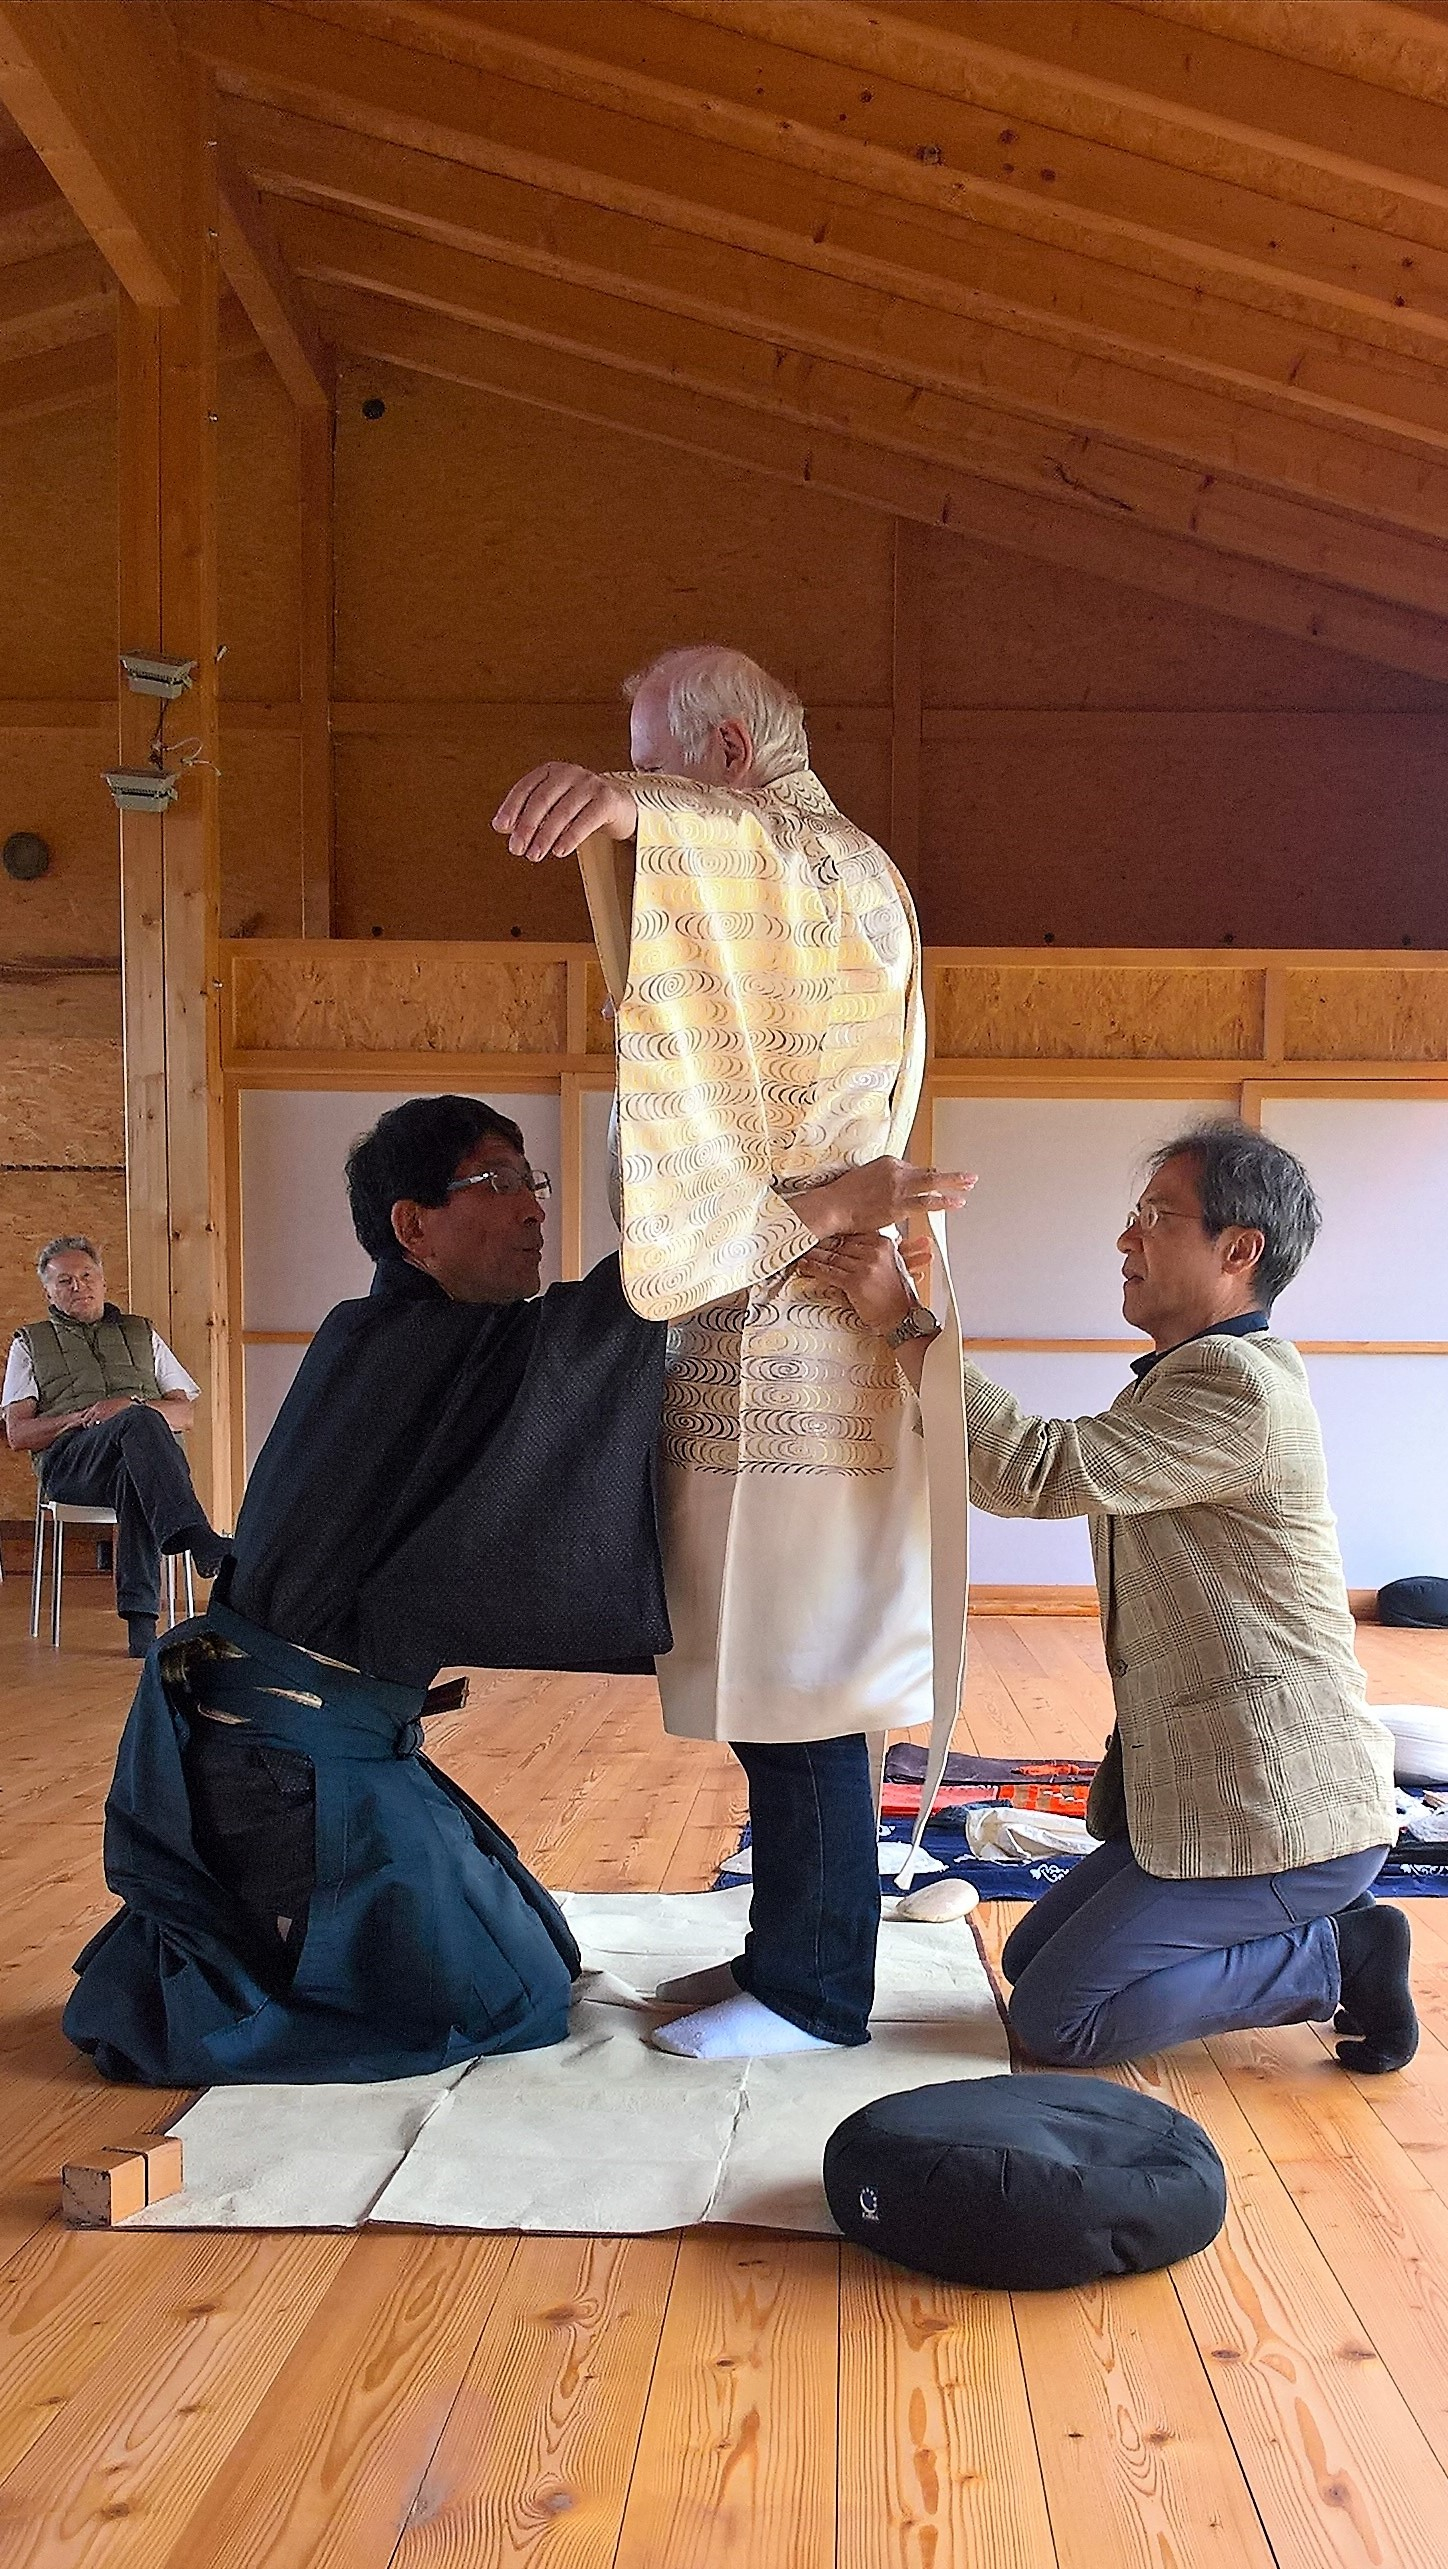 2017.06.17, WienerBerg Kyudojo, Noh Seminar 012